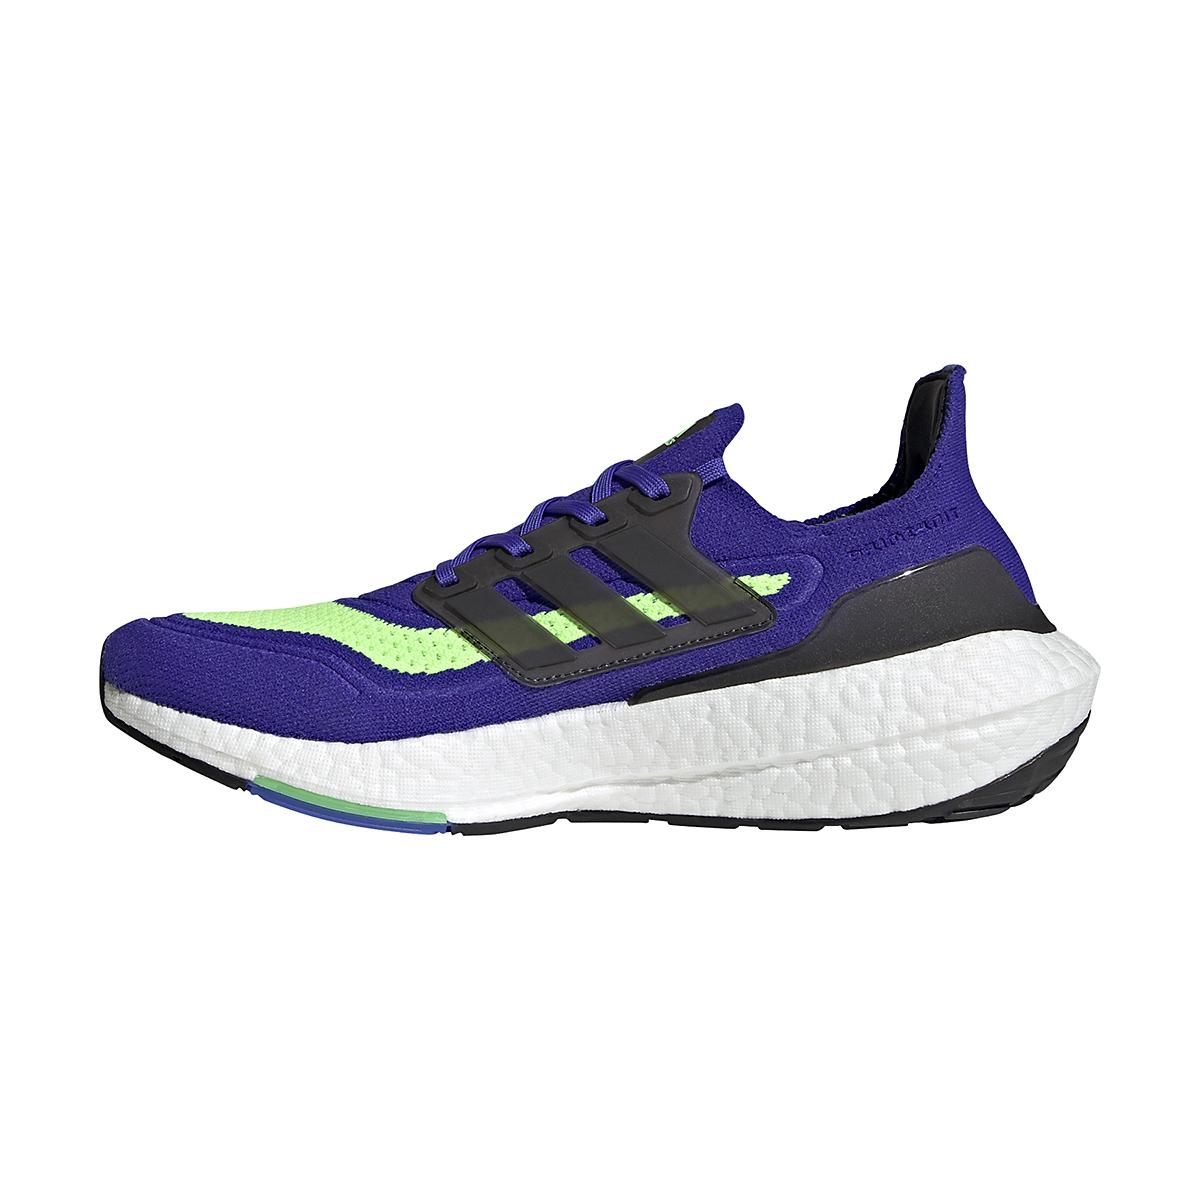 Men's Adidas UltraBOOST 21 Running Shoe - Color: Sonic Ink/Core Black/Screaming Green - Size: 6 - Width: Regular, Sonic Ink/Core Black/Screaming Green, large, image 2